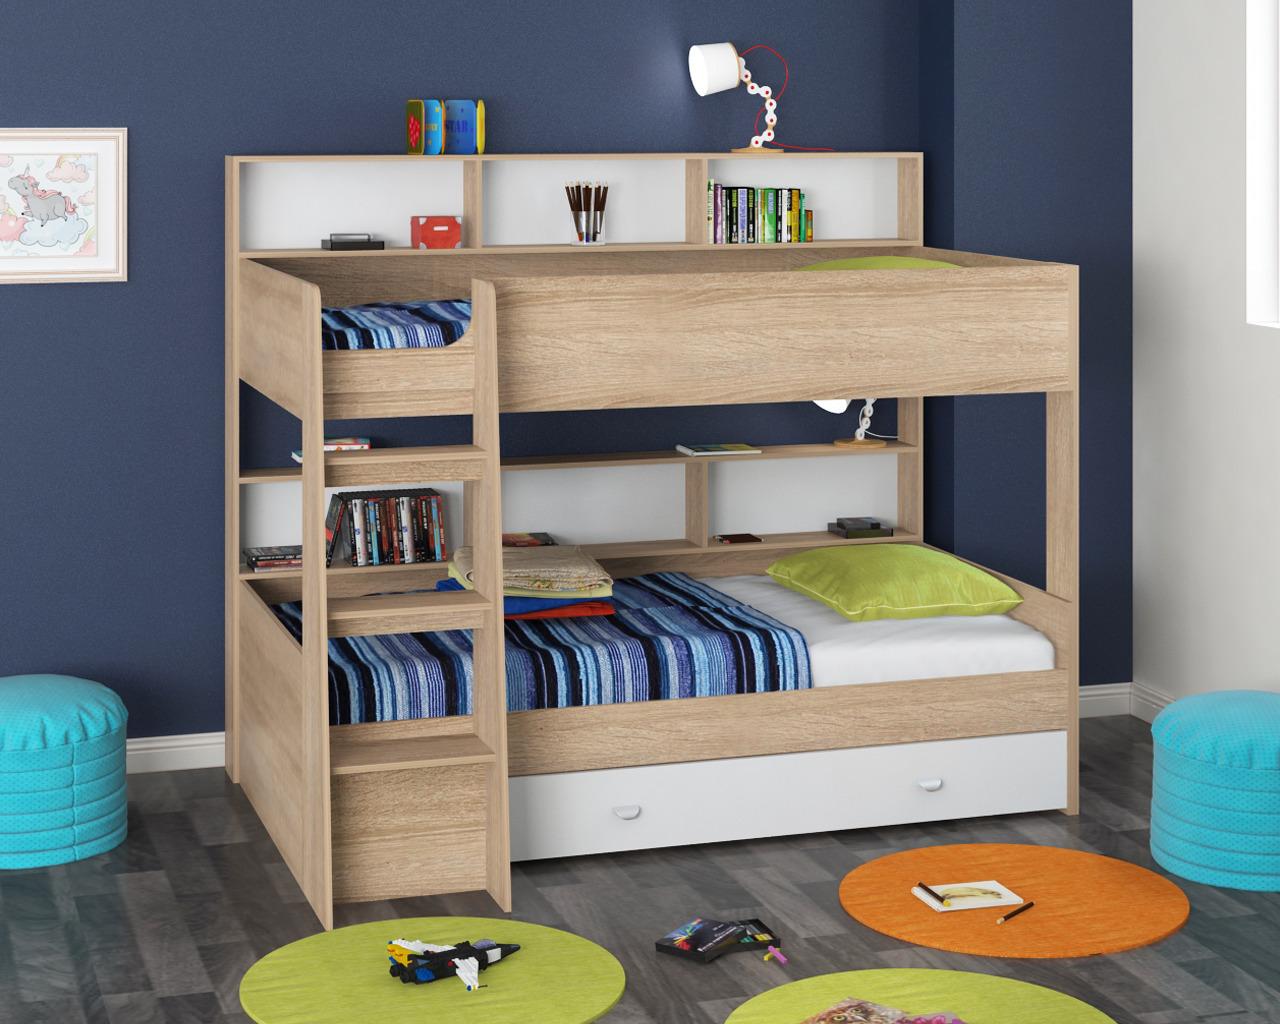 Набор мебели Golden Kids 1 кдКровати двухъярусные<br><br><br>Длина мм: 1830<br>Высота мм: 1400<br>Глубина мм: 2075